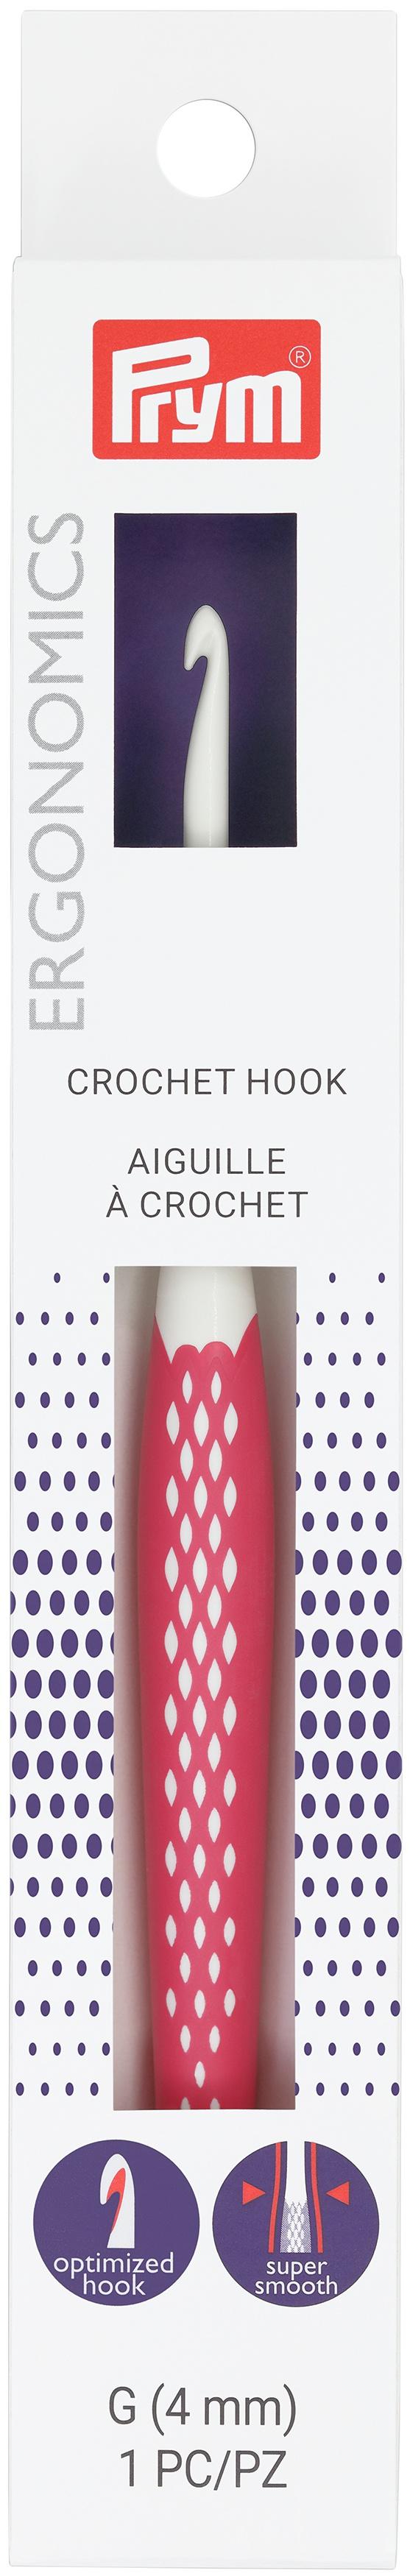 Prym Crochet Hook-Size G6/4mm